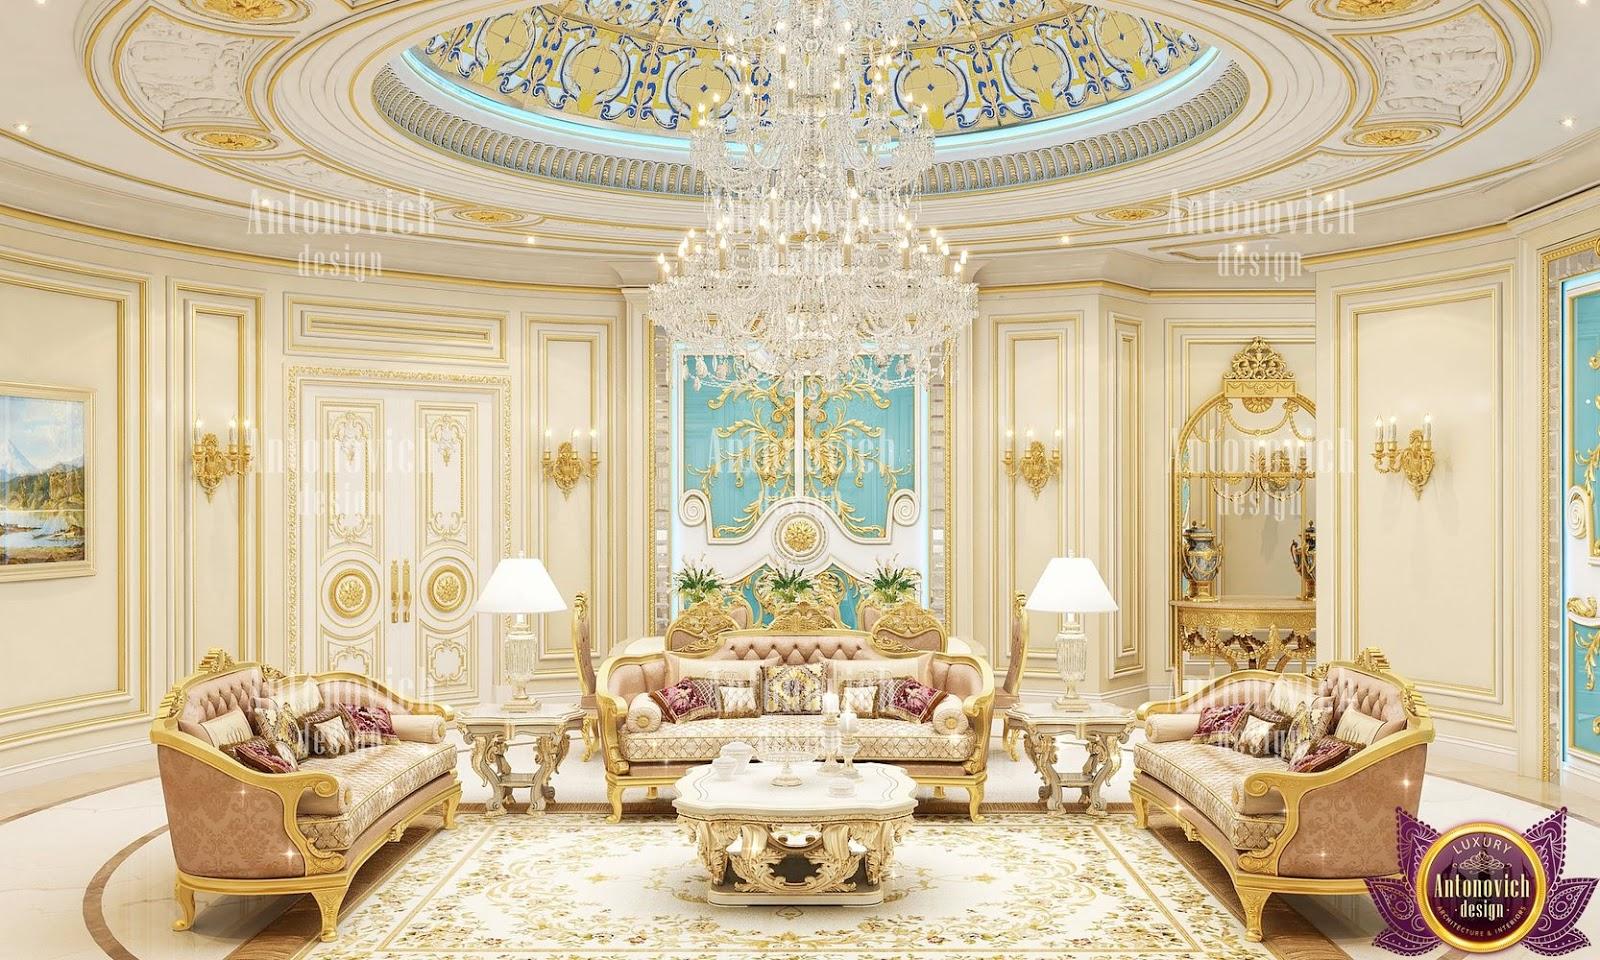 Kitchen Design Usa By Katrina Antonovich: Philippines Interior Design: Amazing Home Designs By